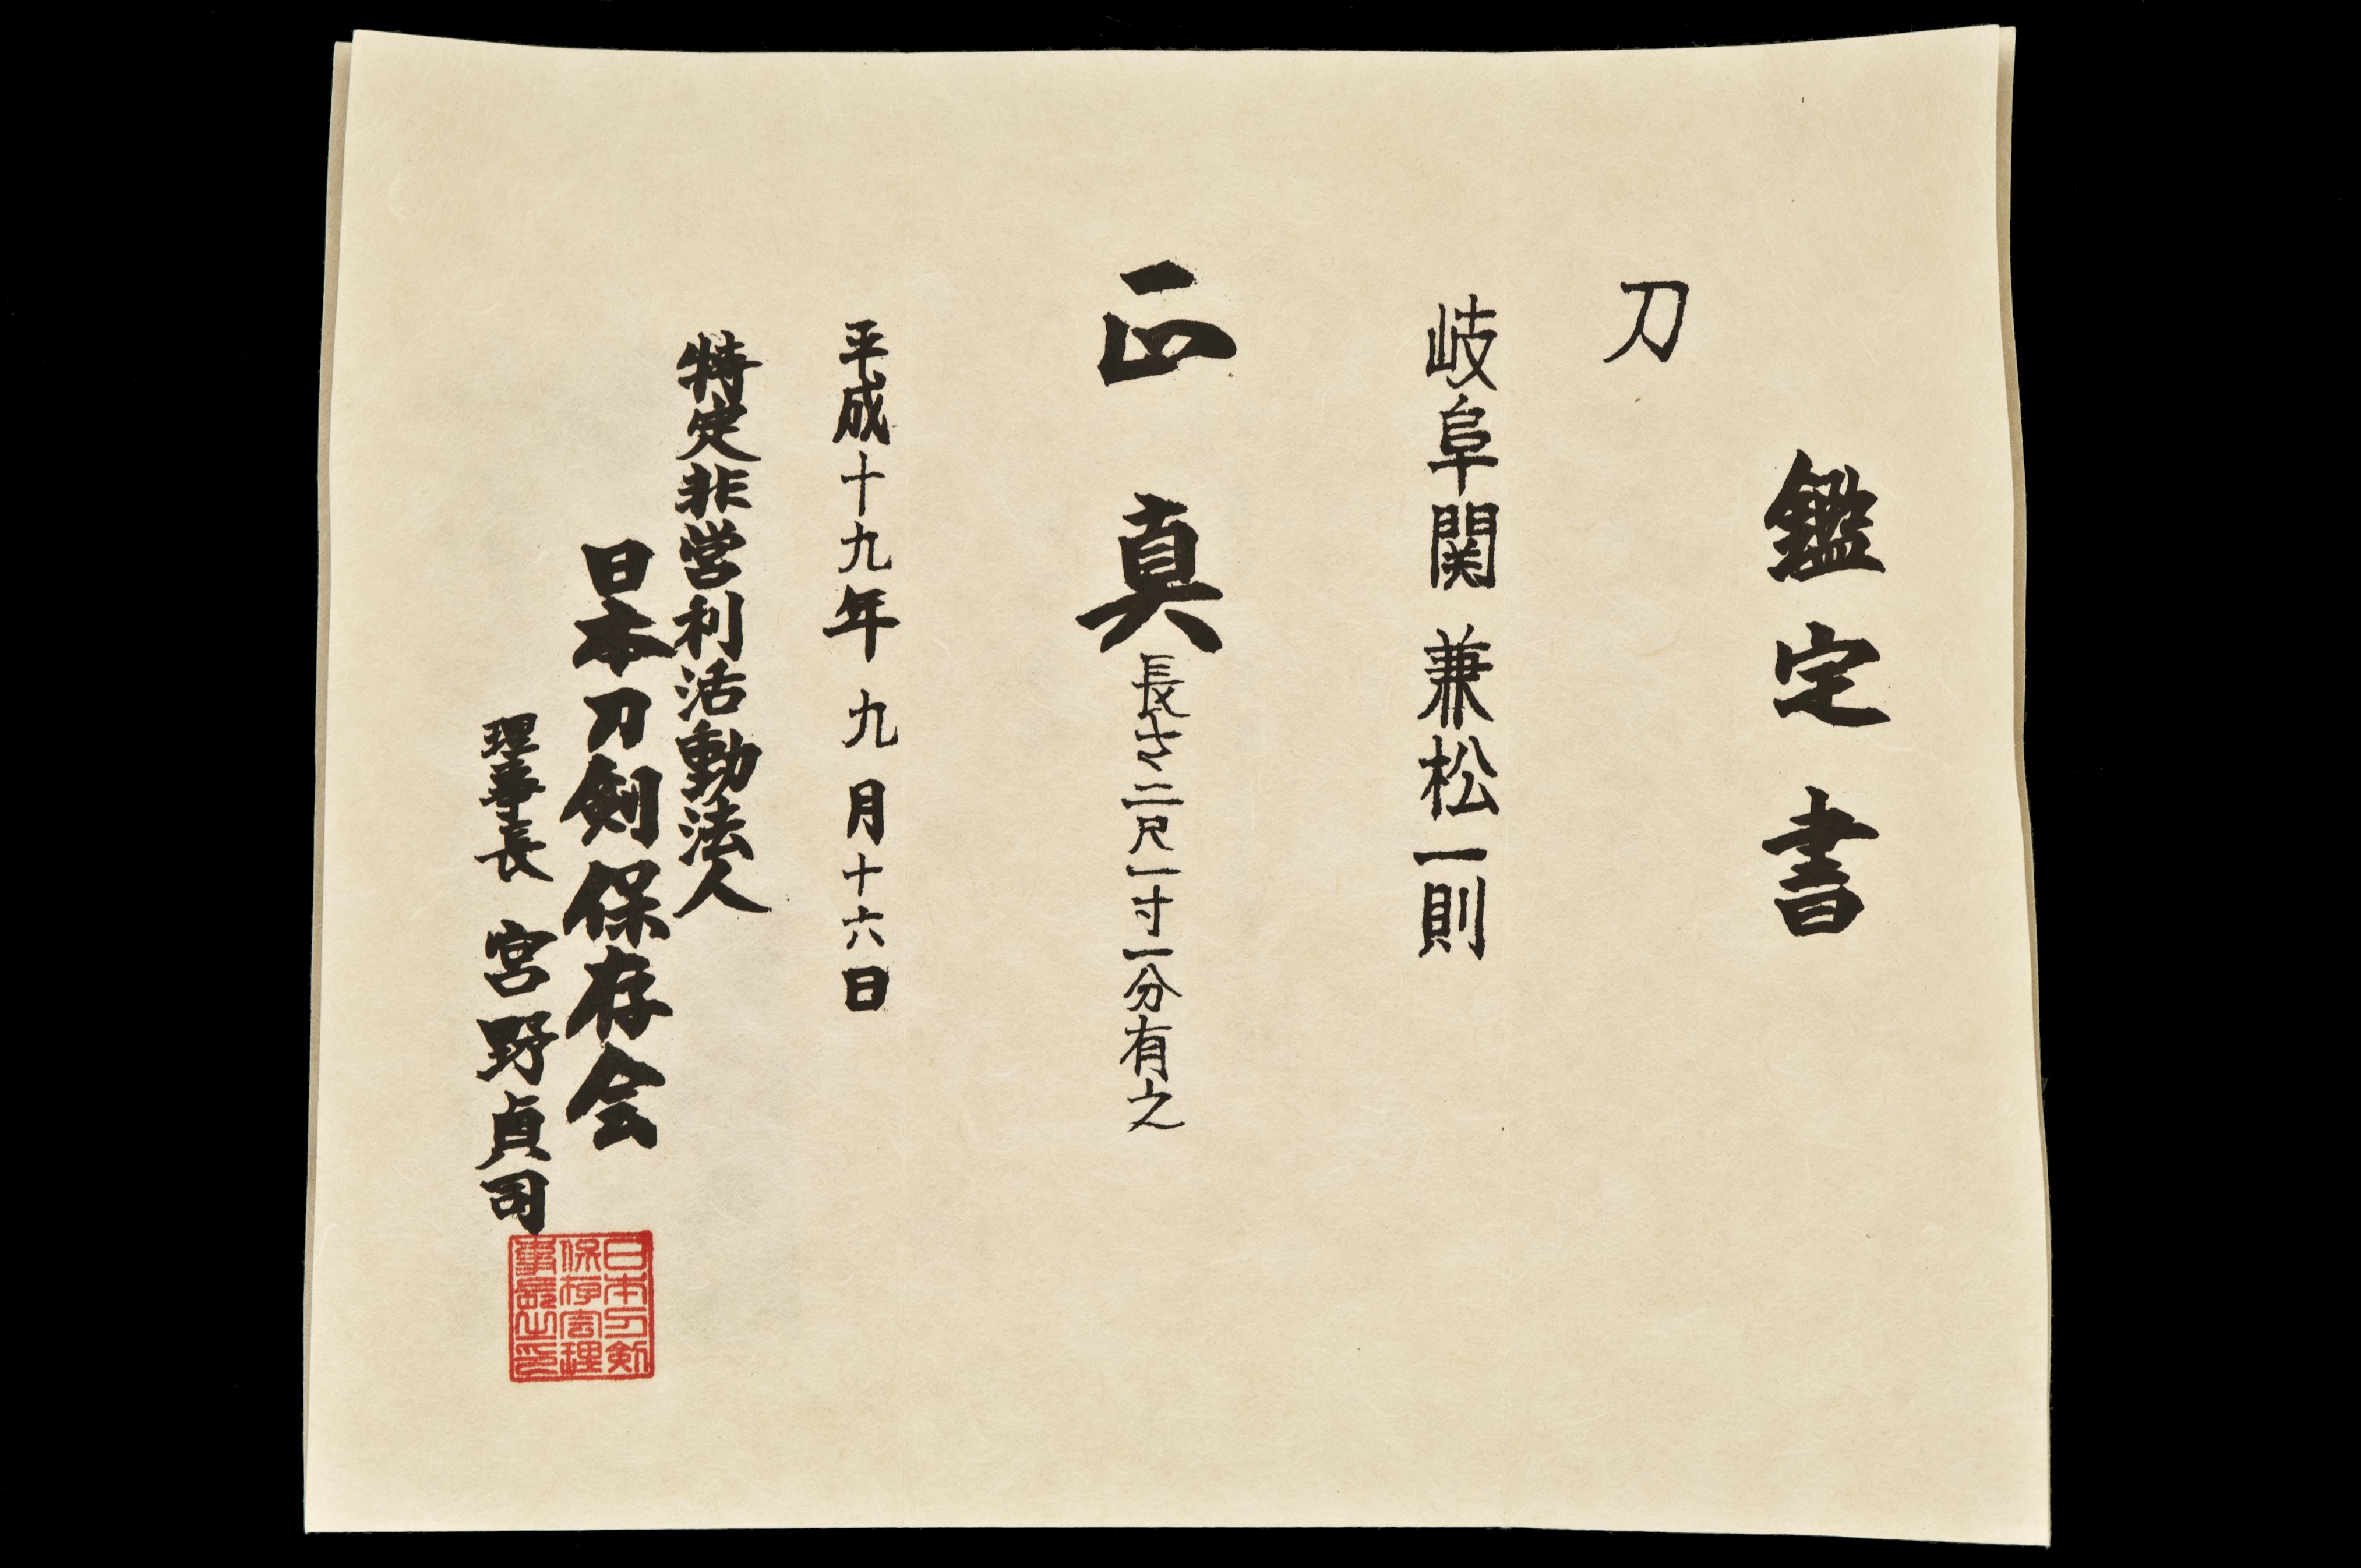 AN UOMATSU ICHINORI WWII ARMY GUNTO « Unique Japan